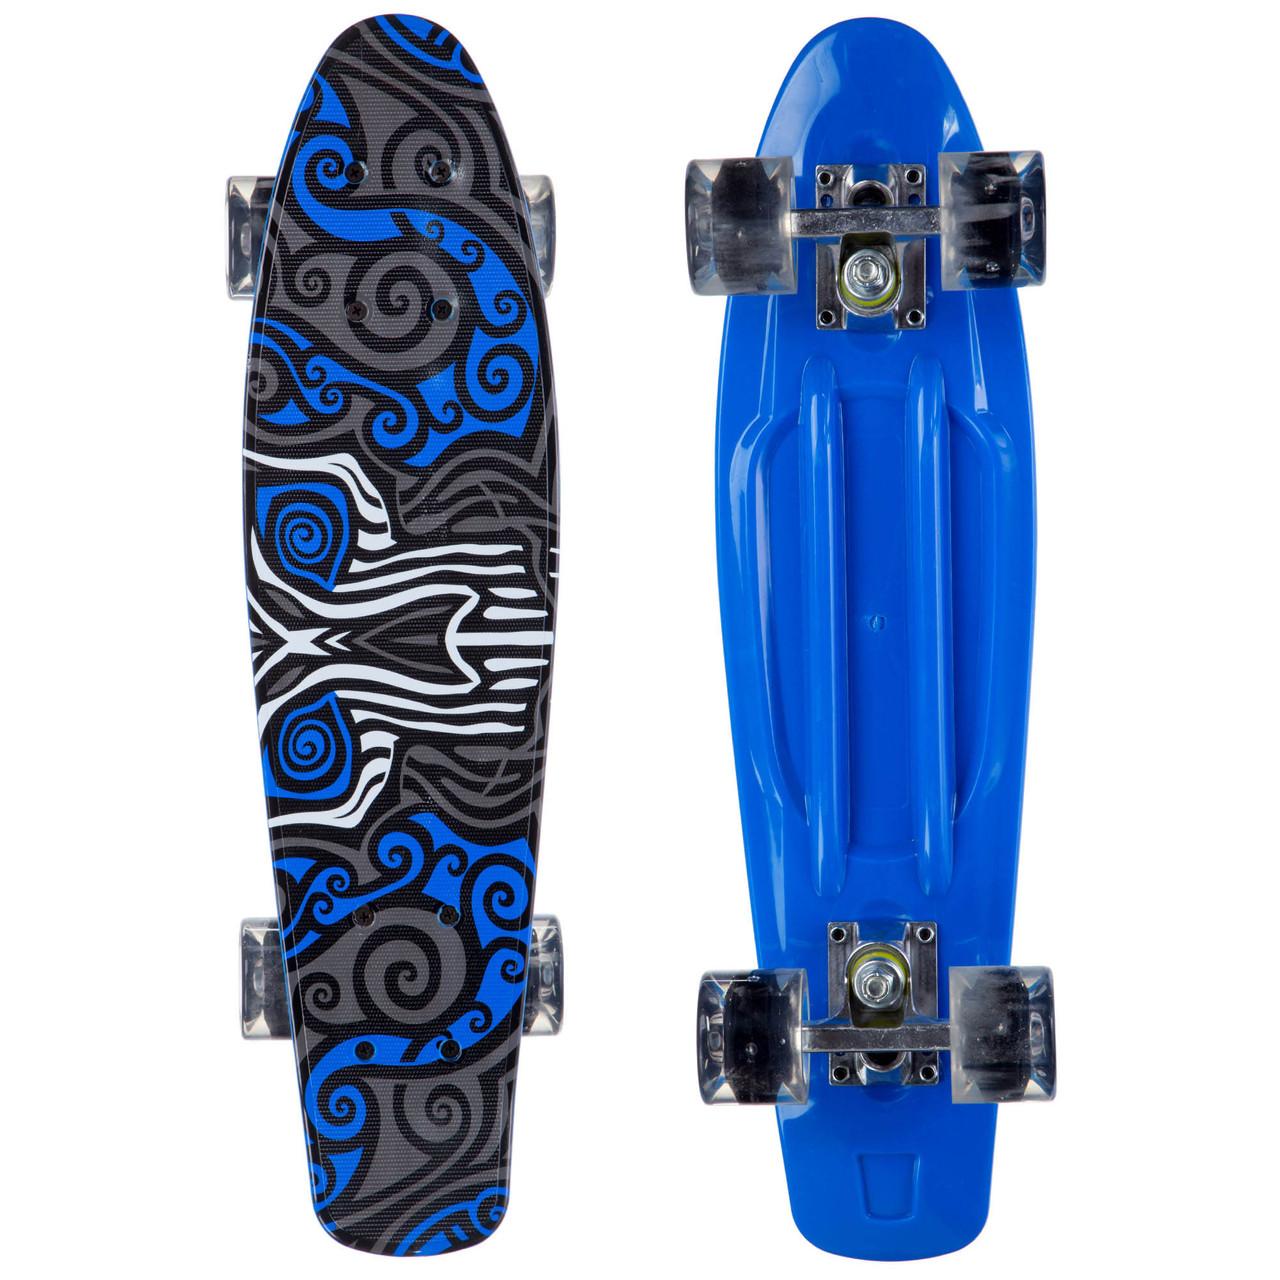 Скейтборд пластиковый Penny 22in со светящимися колесами с рисунком (колесо-PU, р-р деки 56х15см, синий)